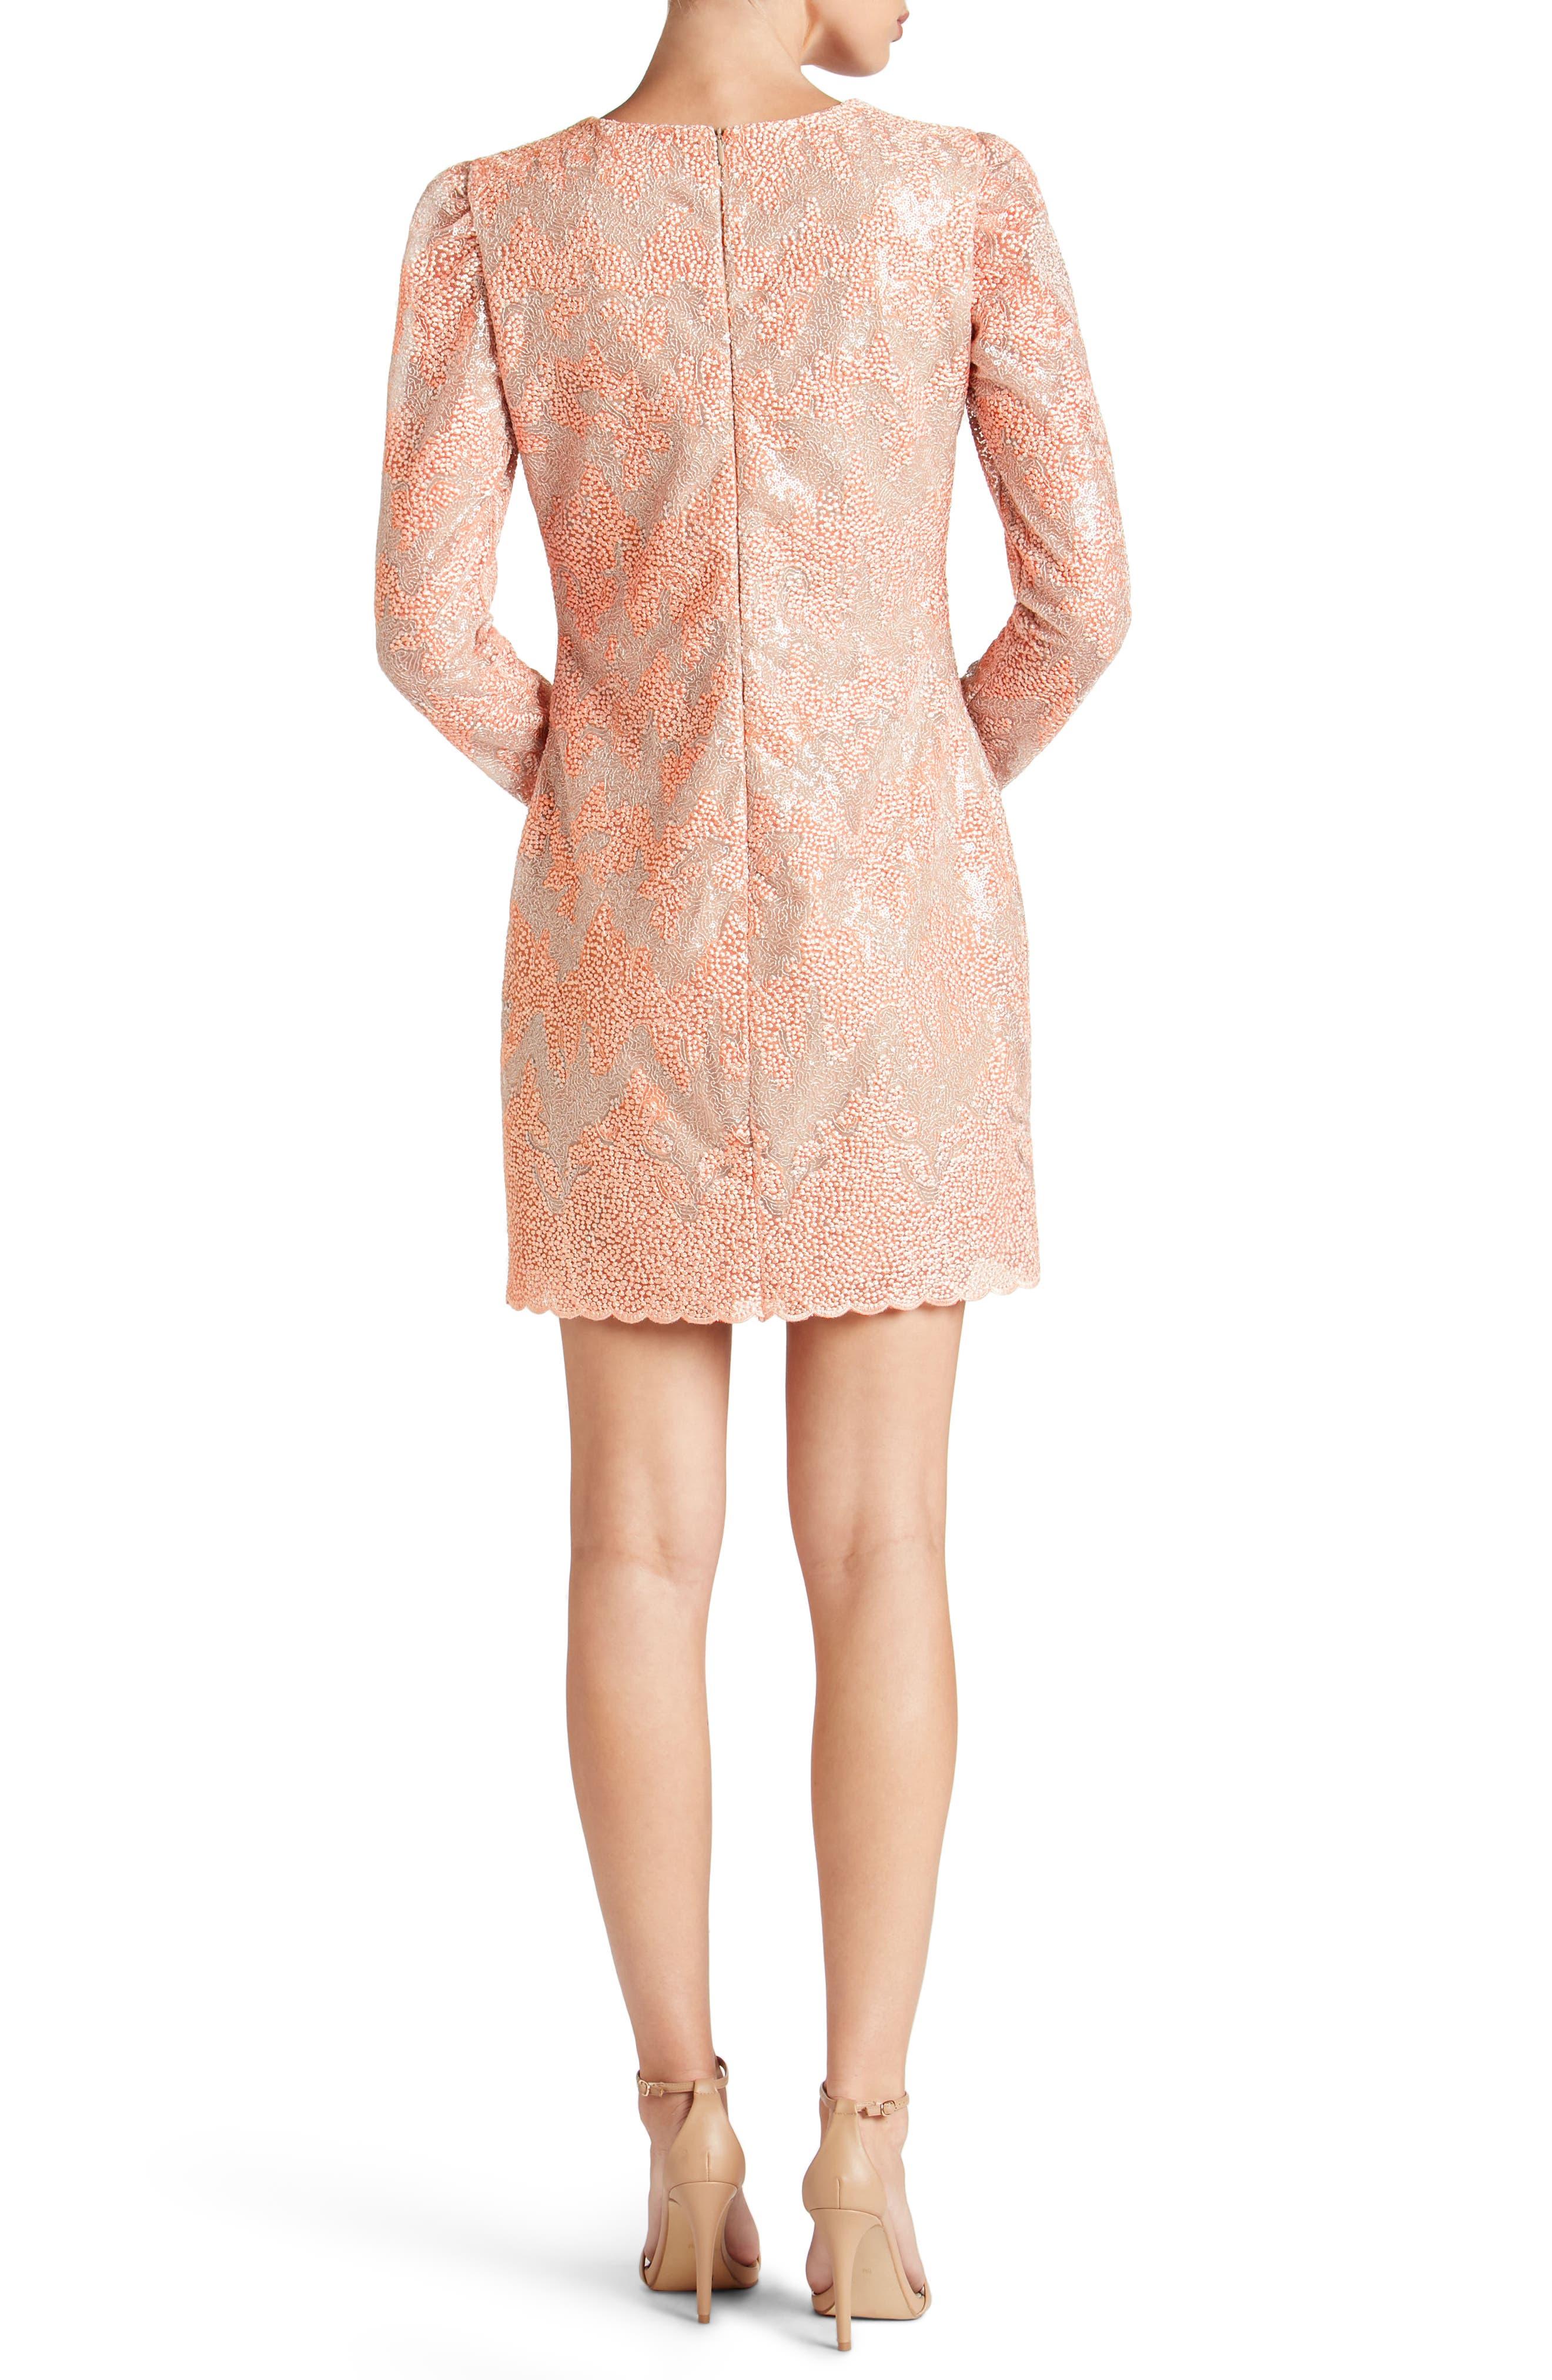 Aubry Sequin Embellished Shift Dress,                             Alternate thumbnail 2, color,                             686